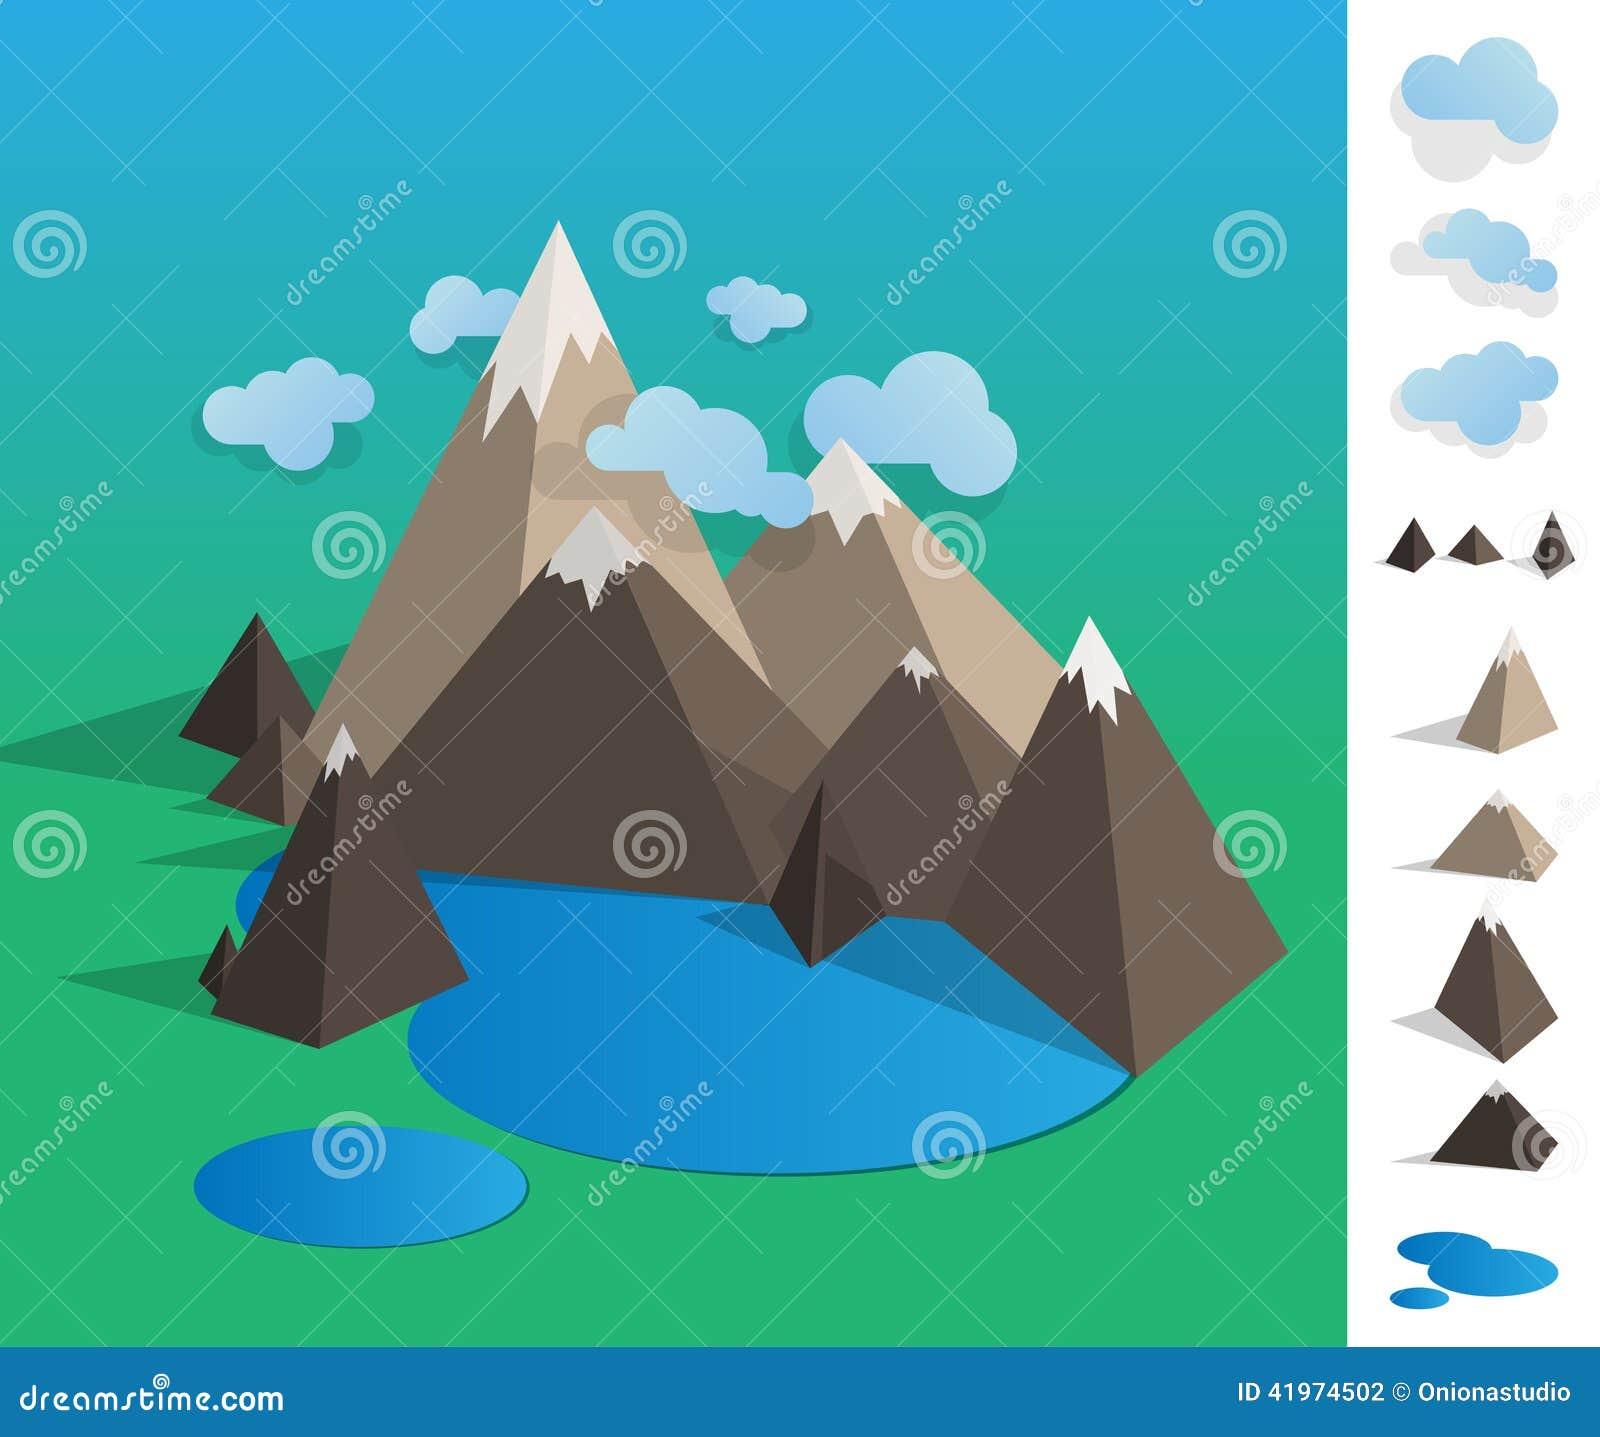 Landscape Illustration Vector Free: Illustration Of Geometric Mountain Lake Landscape Stock